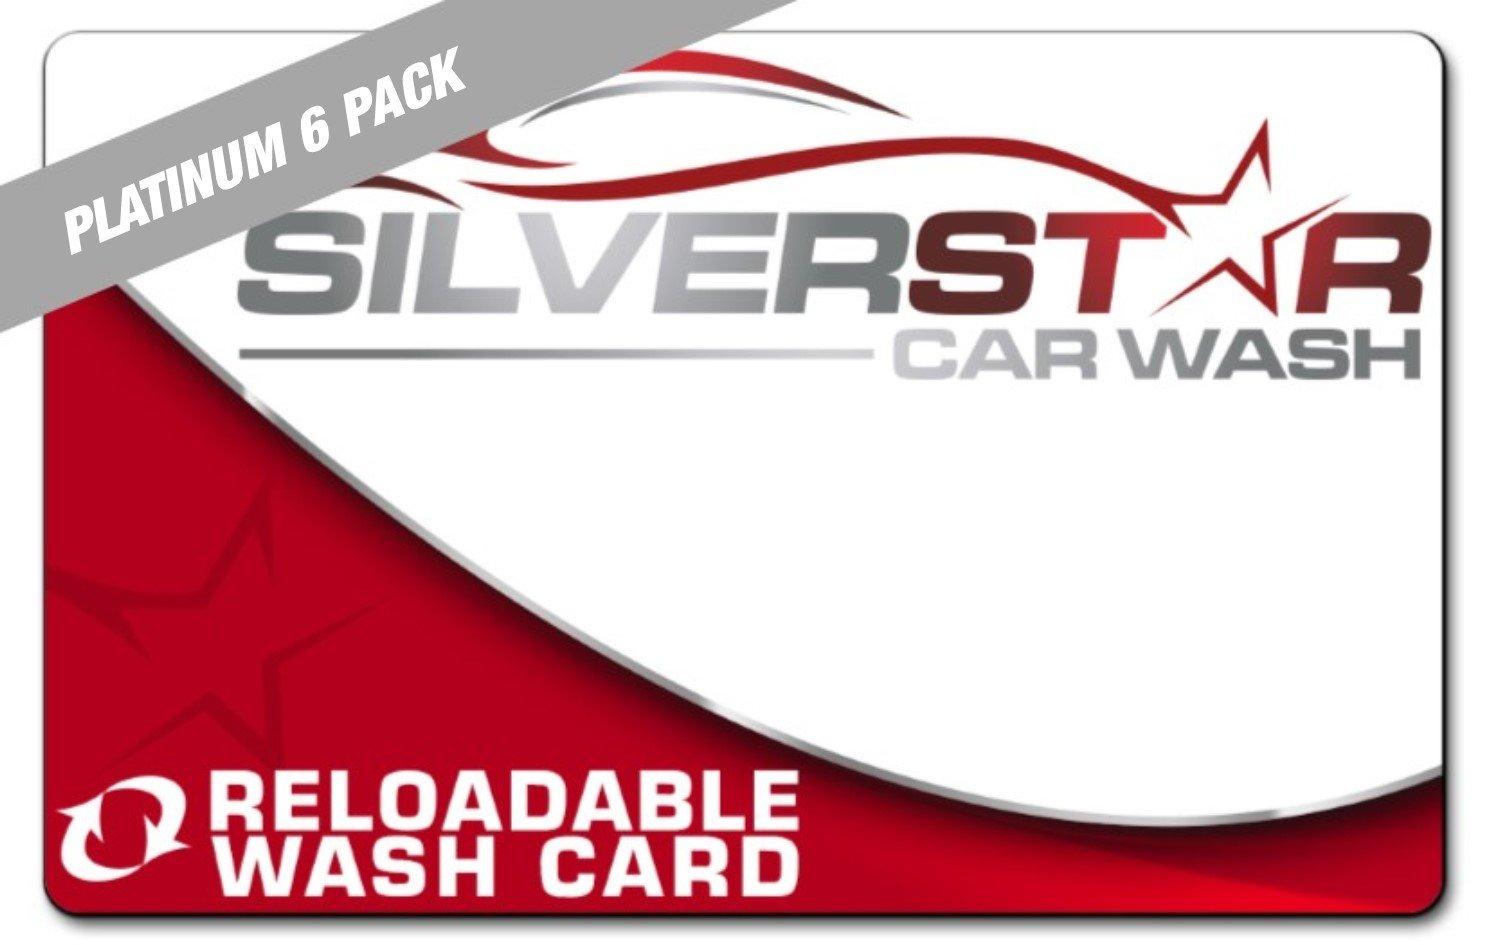 Platinum Wash Card: 6 Pack